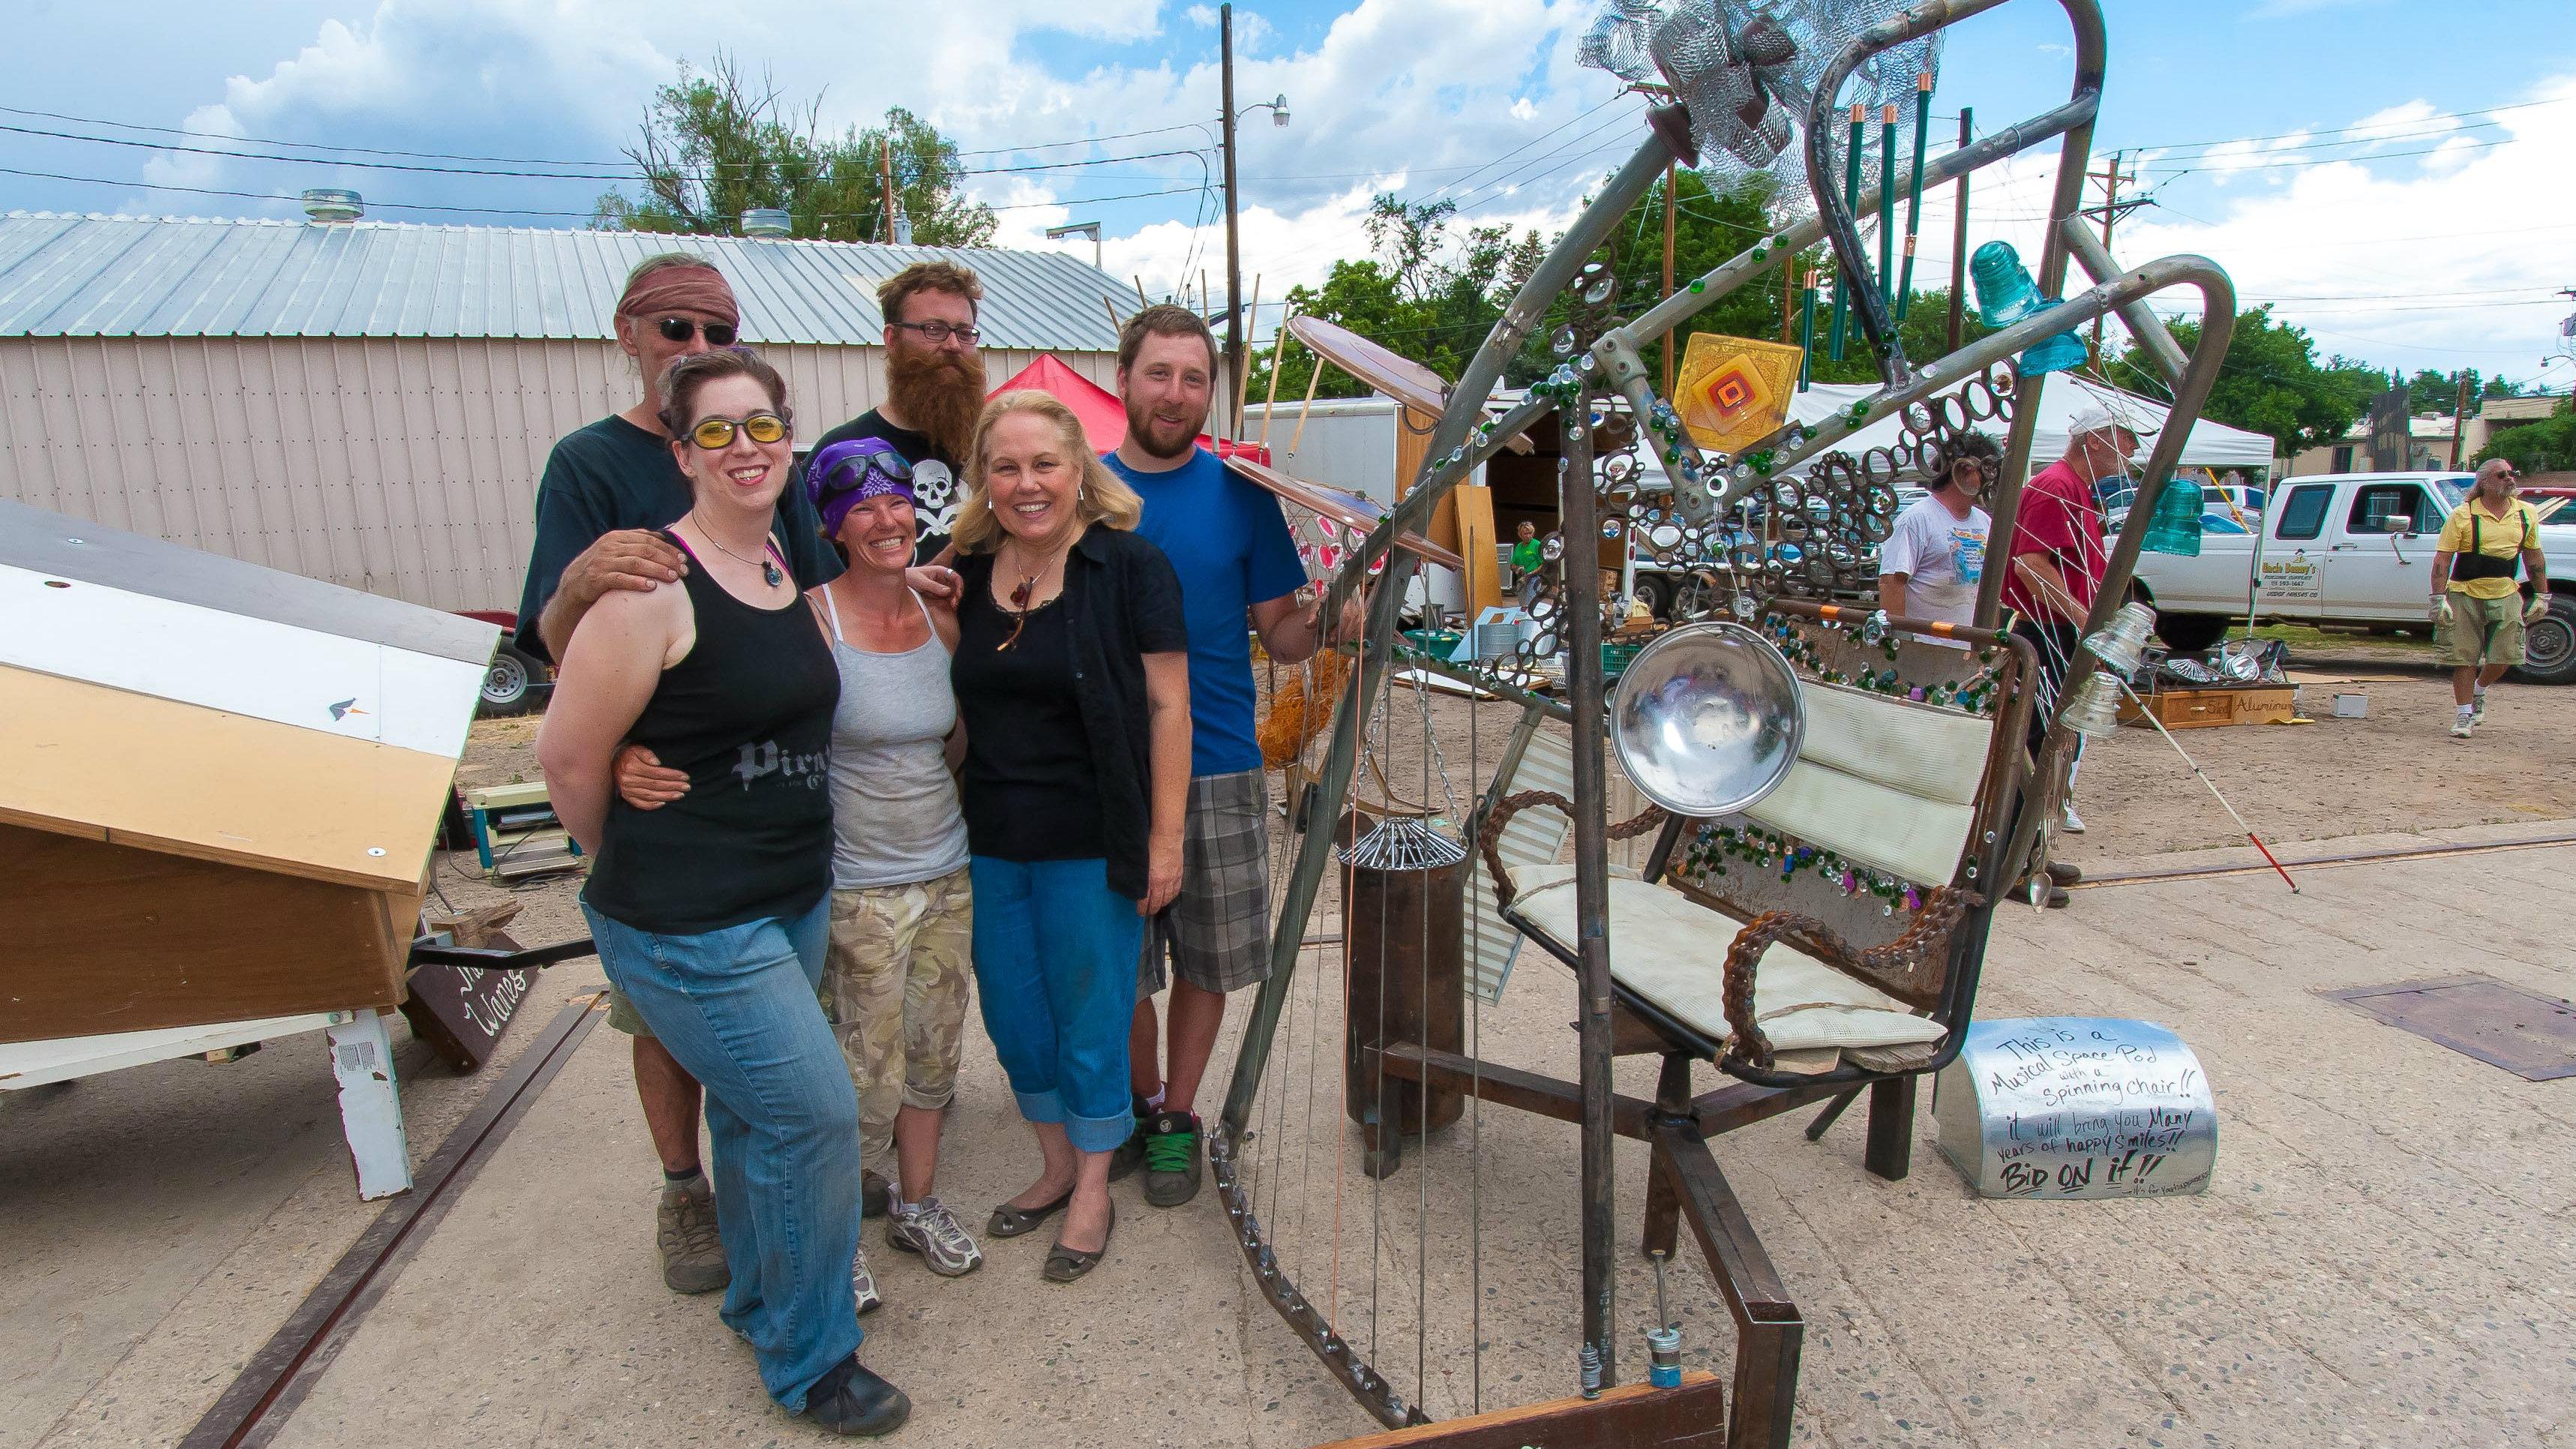 Photo: The Sculpture Games 2013 winner